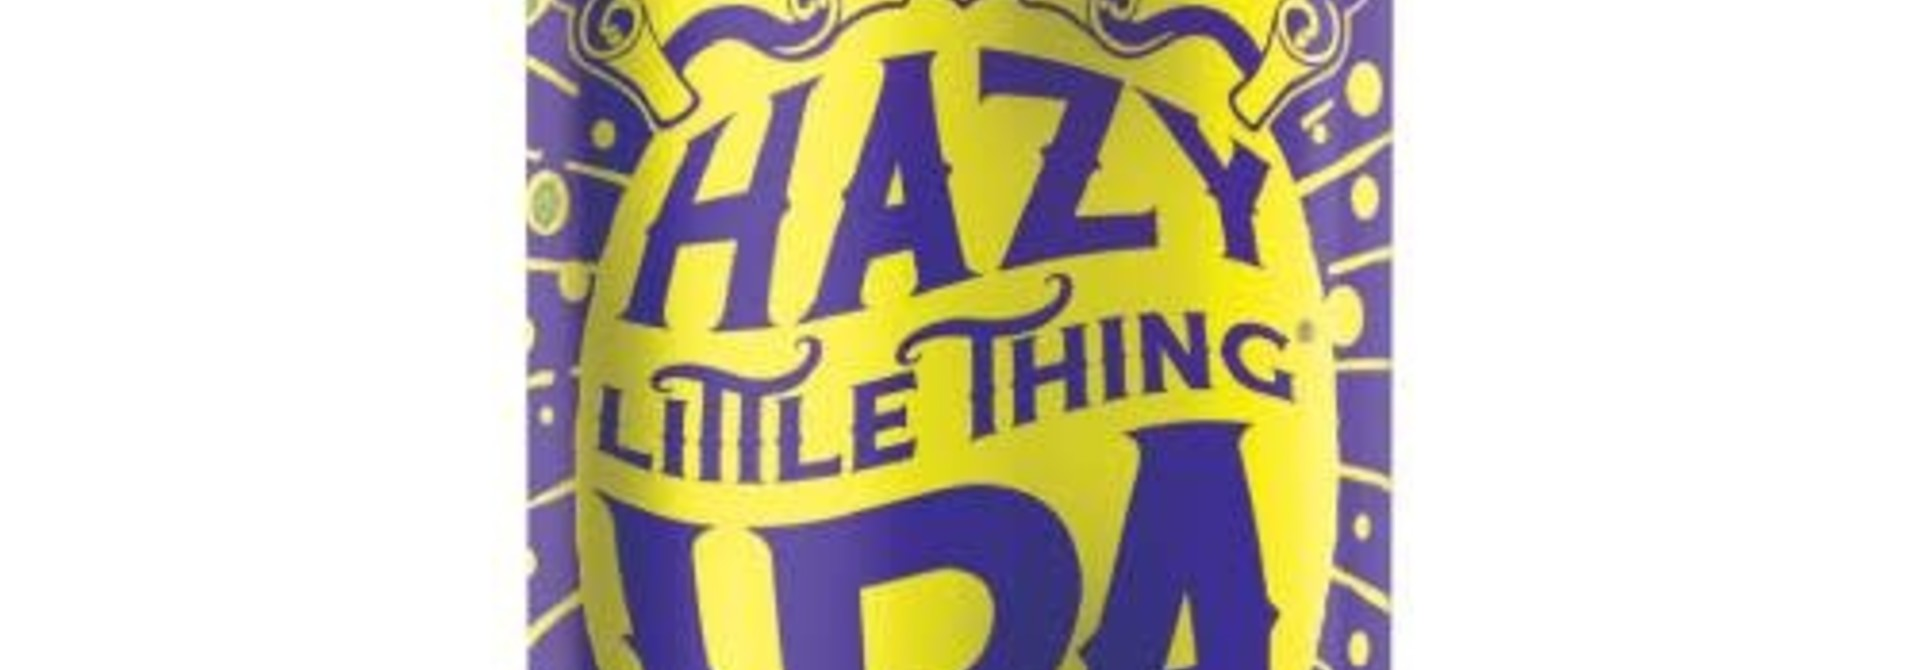 SIERRA NEVADA - HAZY LITTLE THING